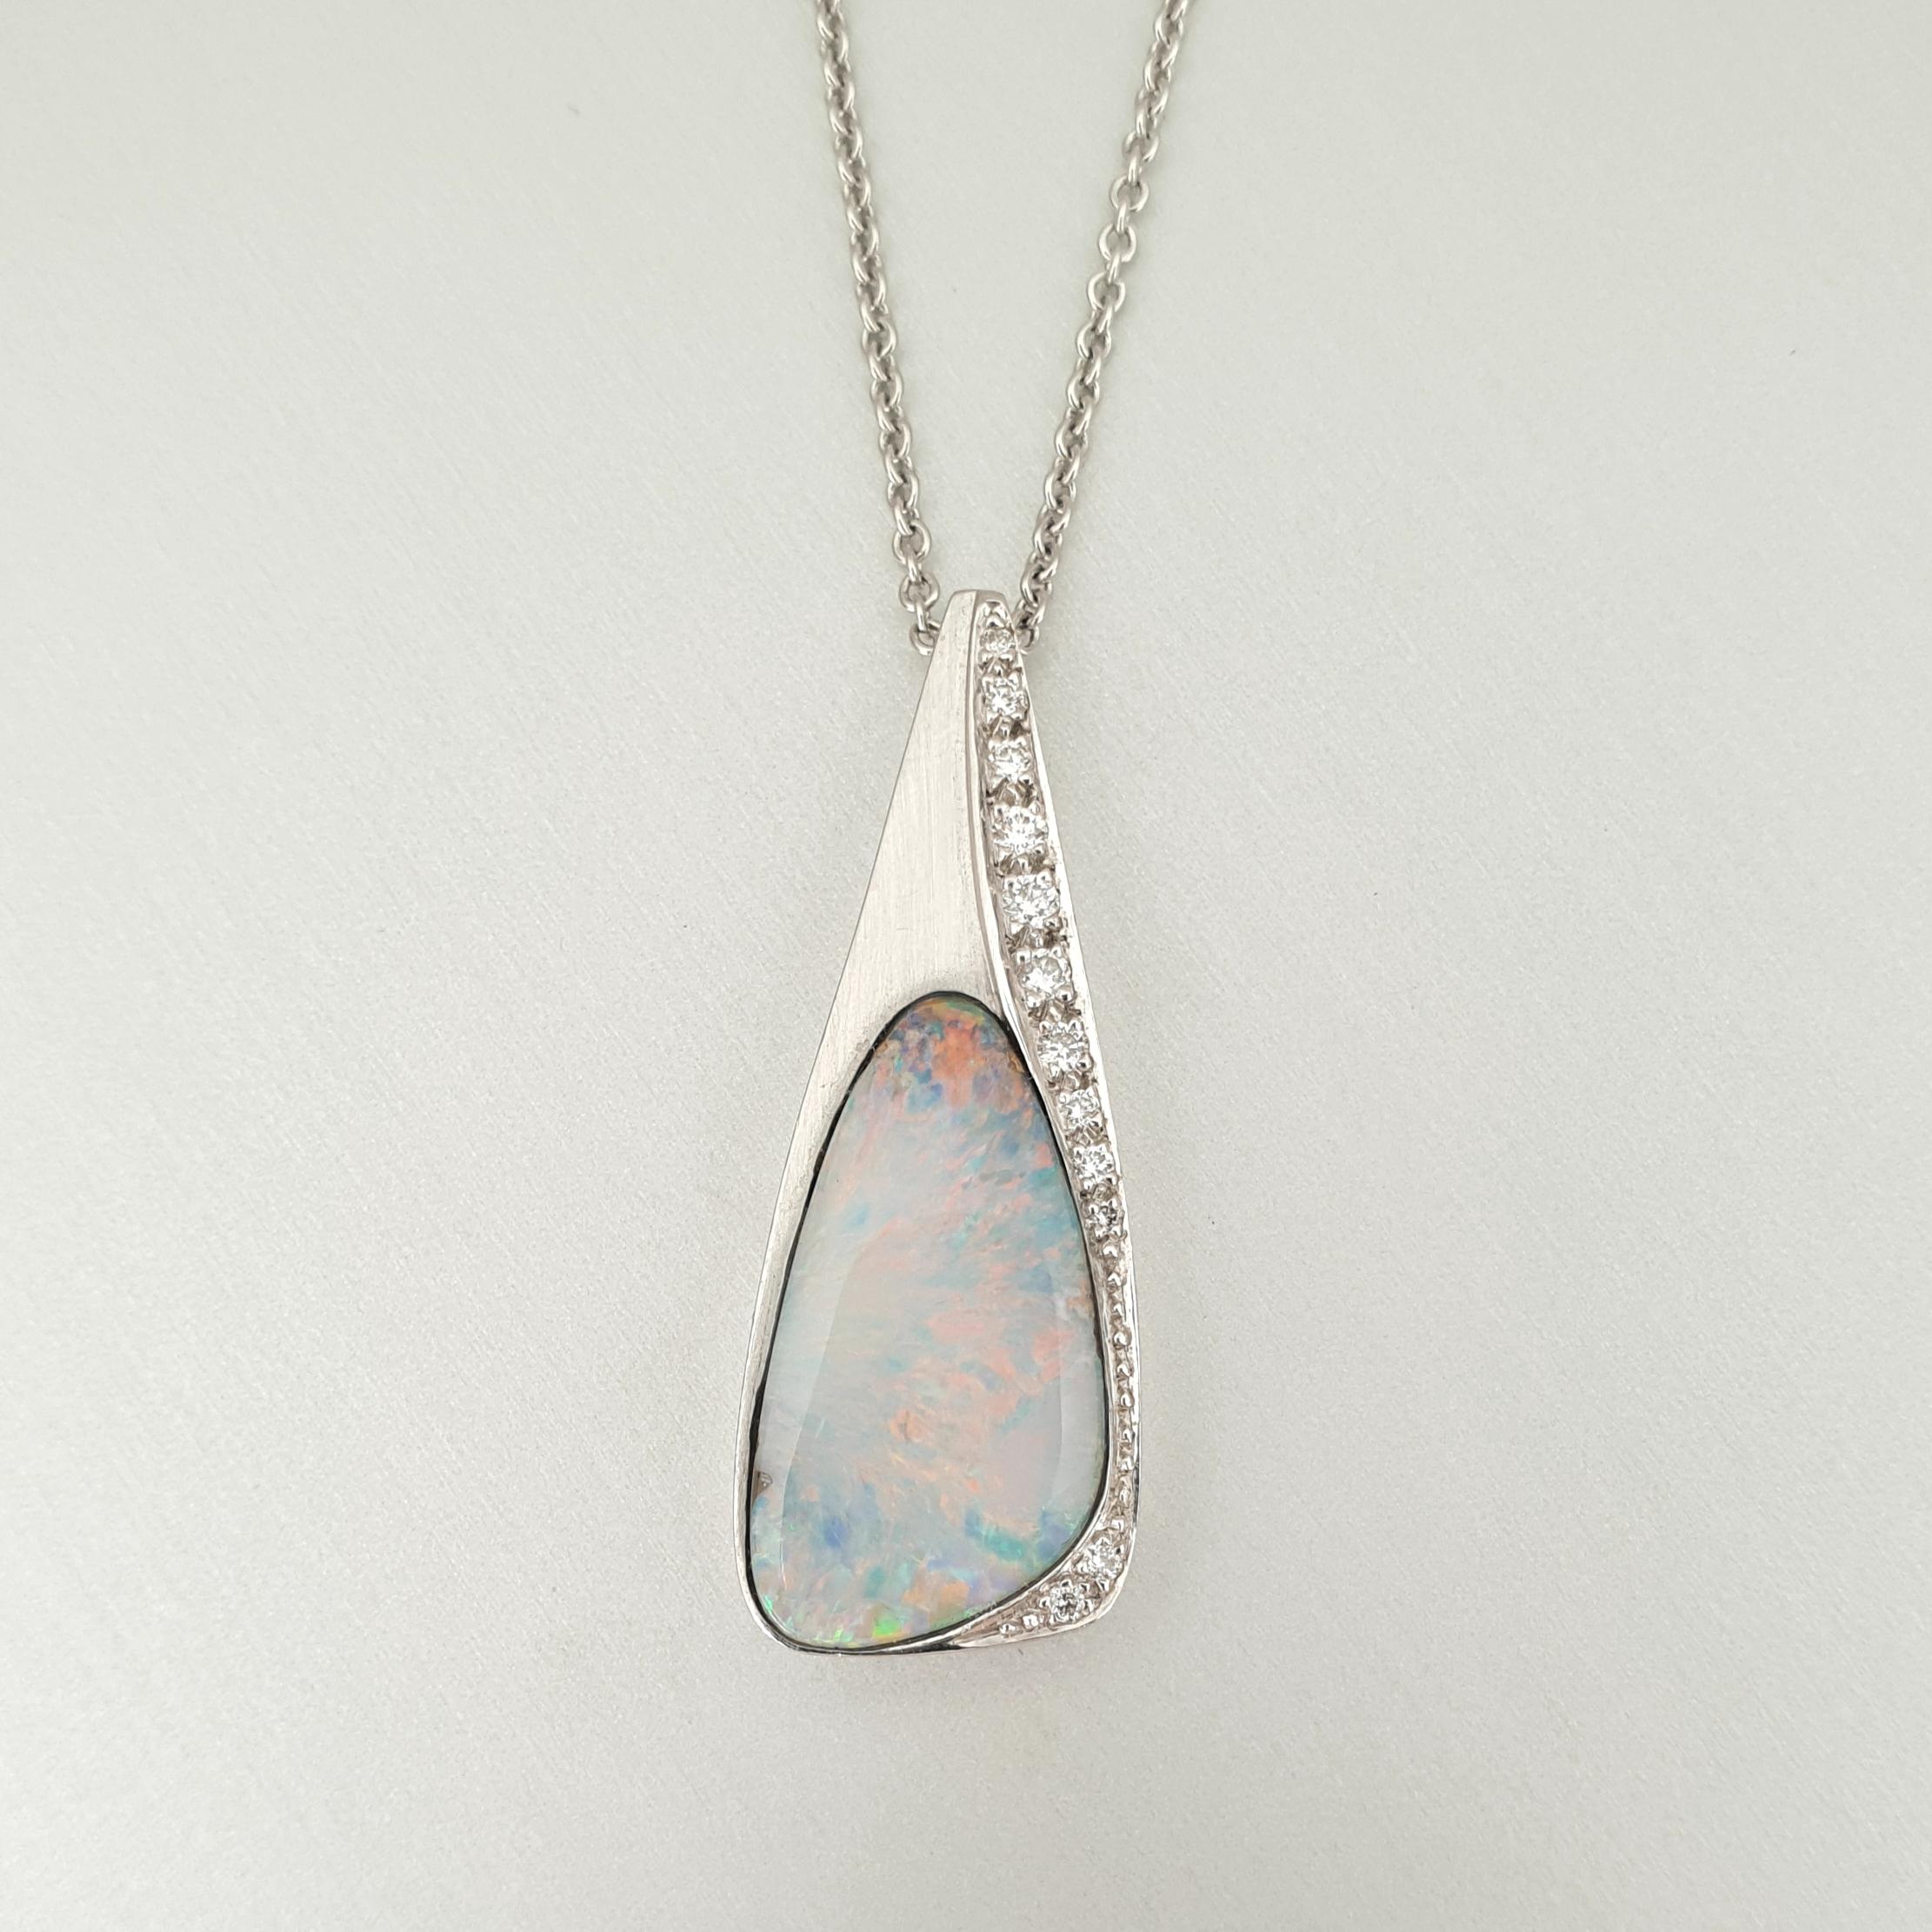 'Caelum' Boulder Opal Pendant